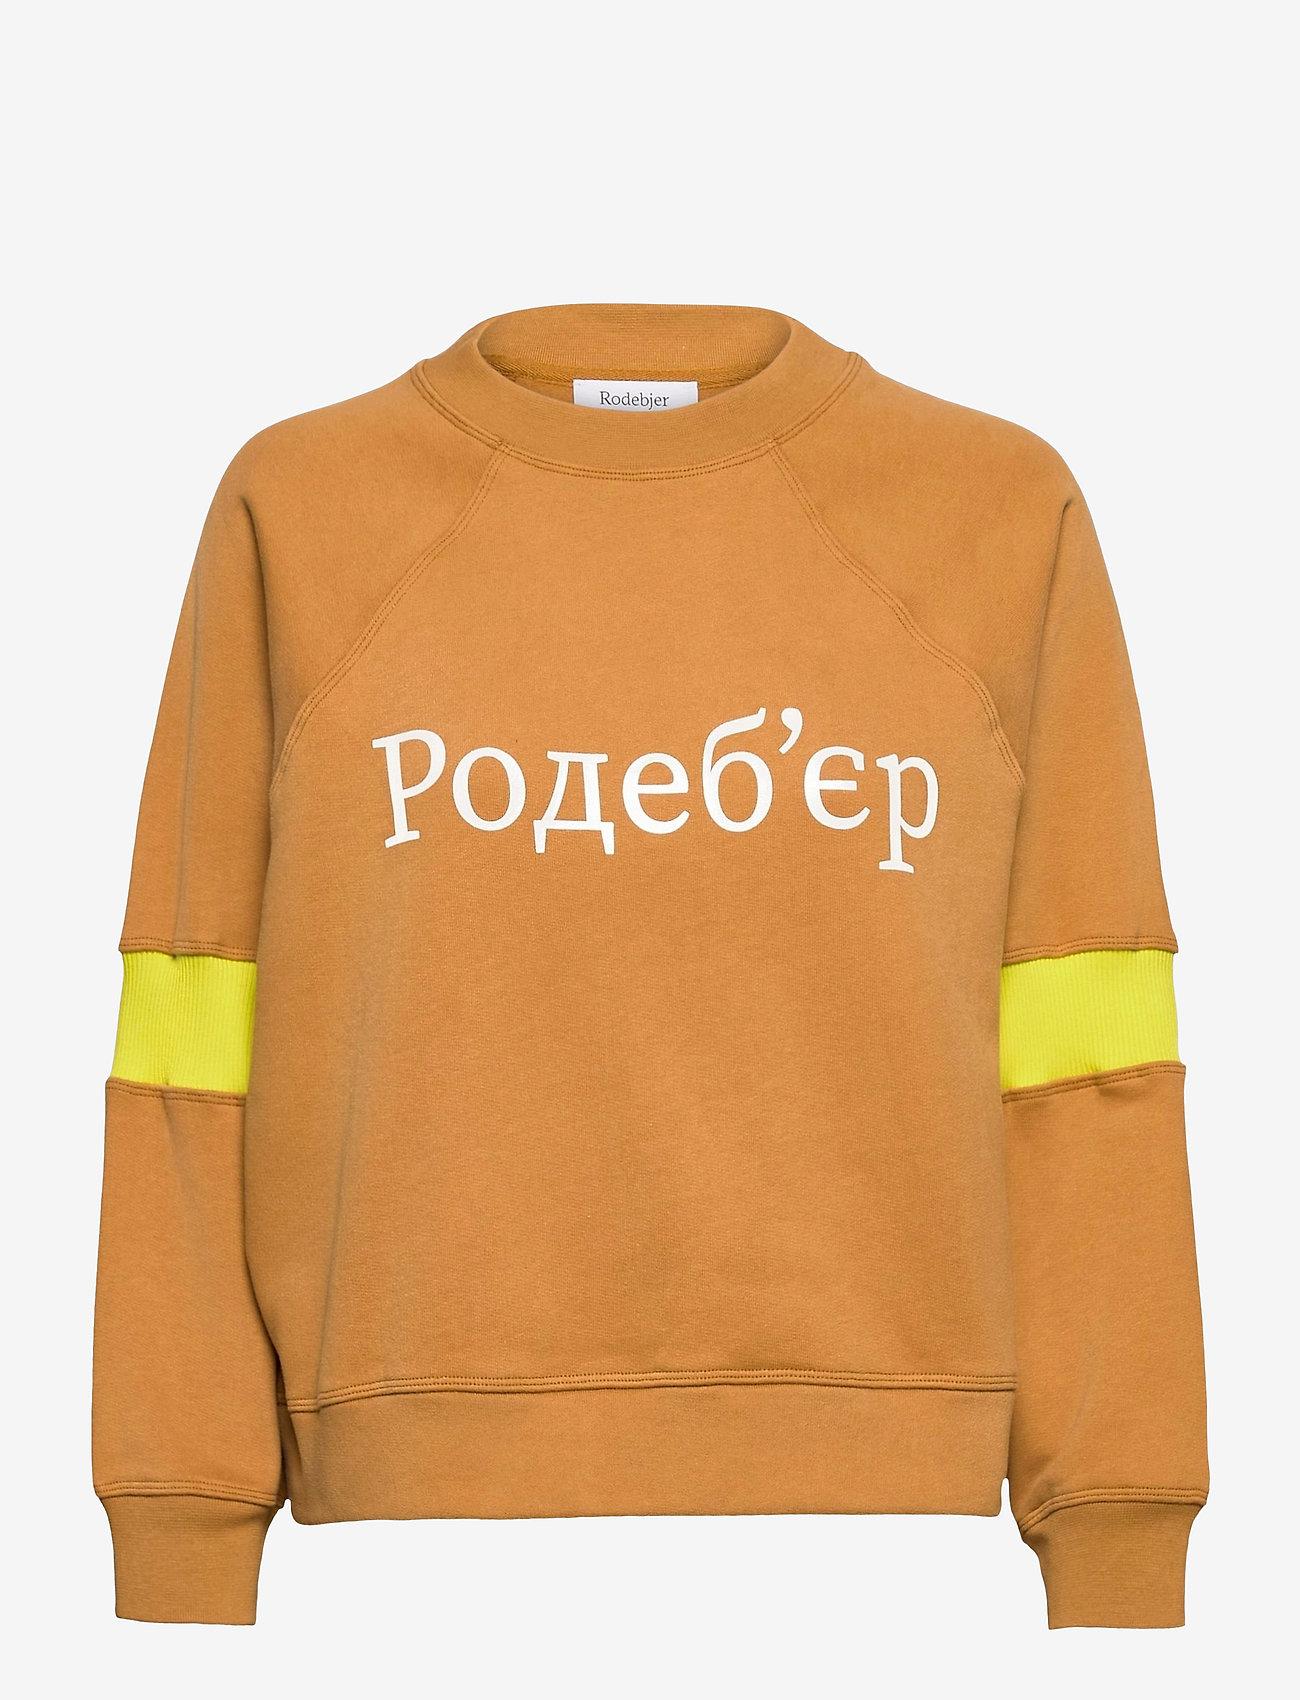 RODEBJER - RODEBJER JALENA - sweatshirts en hoodies - havanna brown - 0